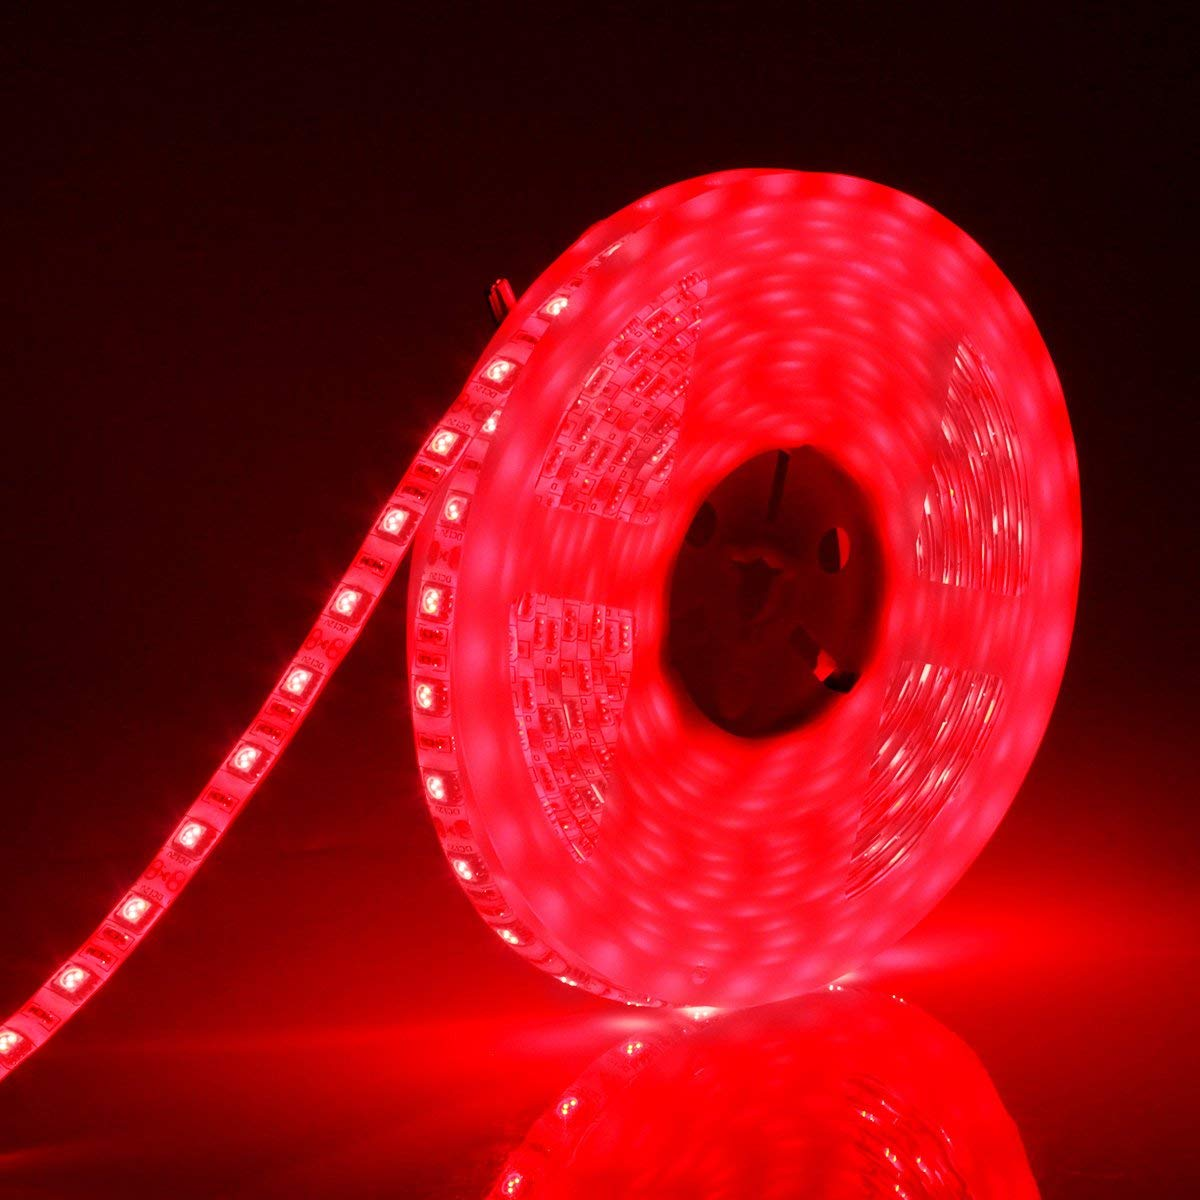 SUPERNIGHT DC12V 5M 16.4Ft Red 5050SMD 300LED Waterproof Flexible LED Light Strip lamp White Tape Version